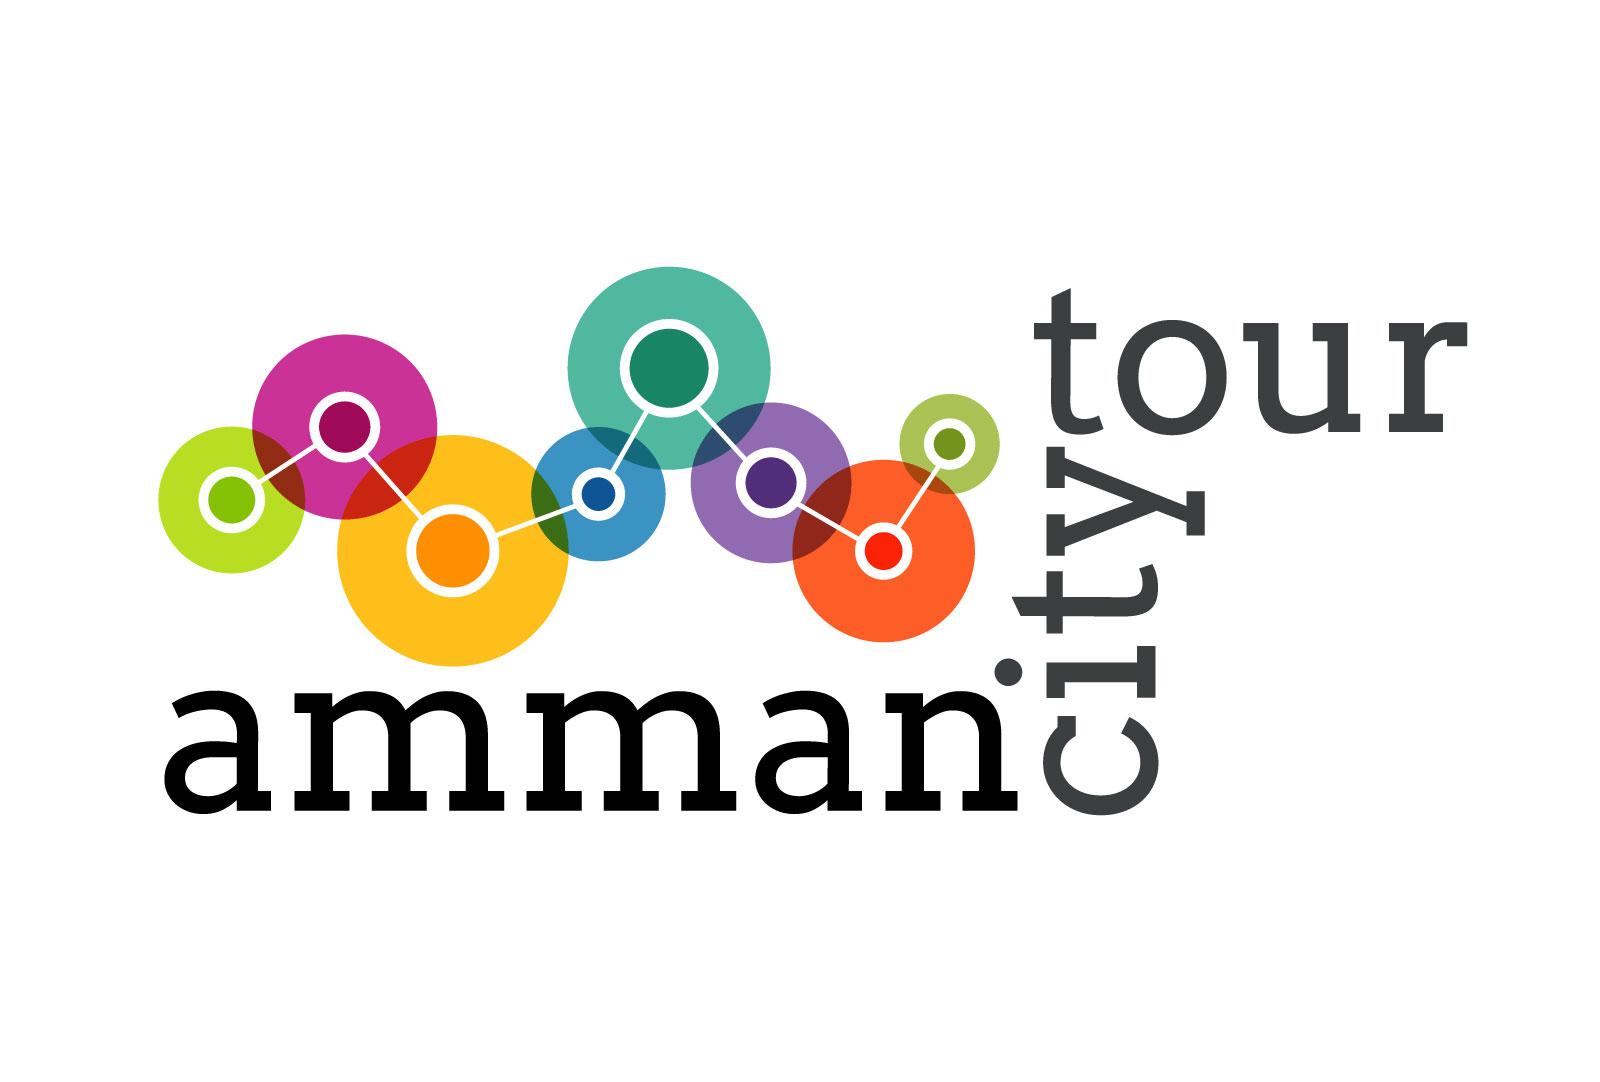 Amman City Tour branding design by Zaid Masannat - Main Logo